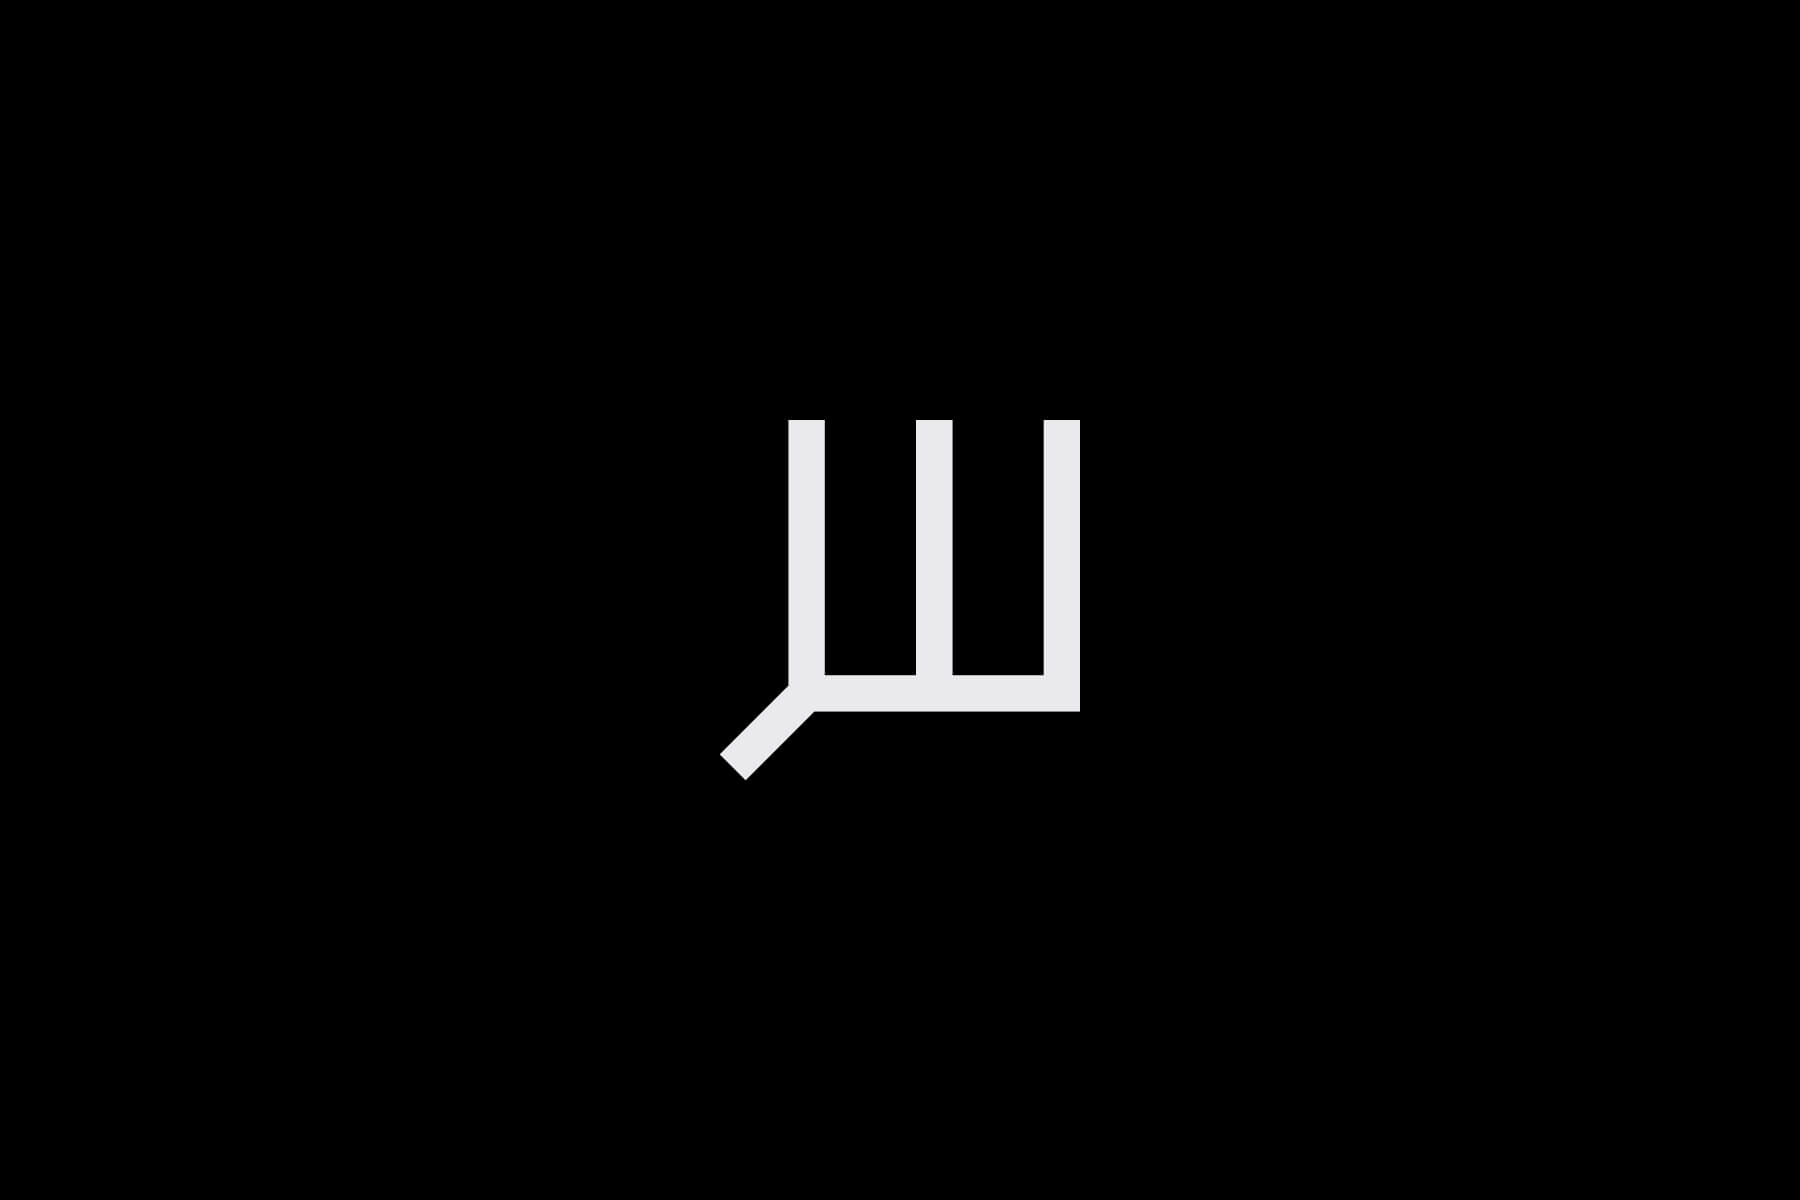 grafikdesign-janis-weidner-lindau-bodensee-logo-05